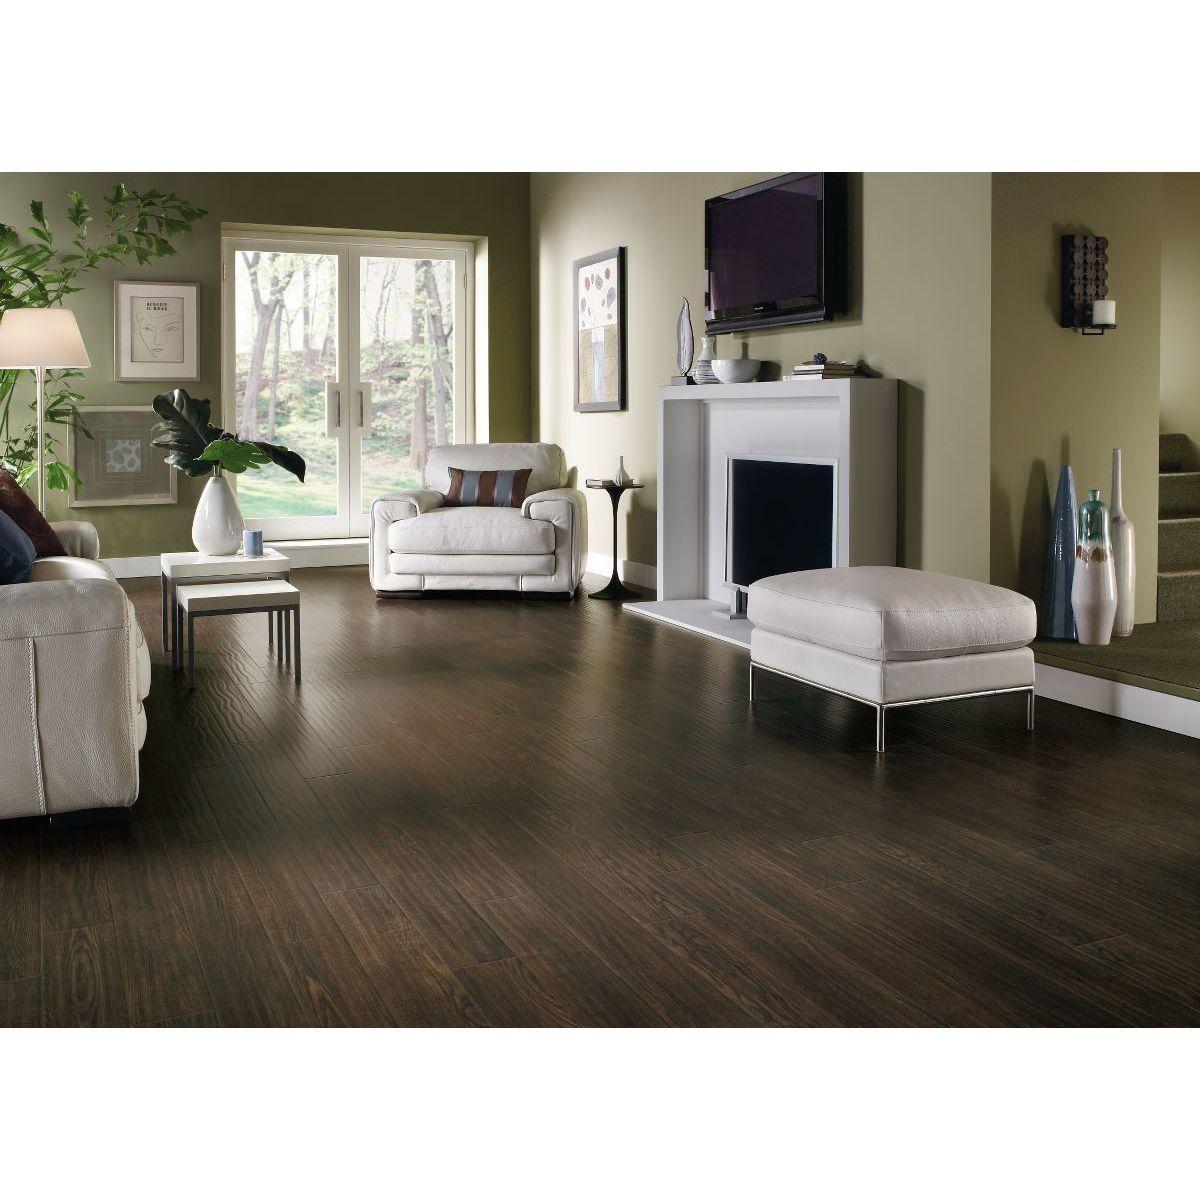 Armstrong rustics premium laminate square feet per case flooring pack prairie brown black also